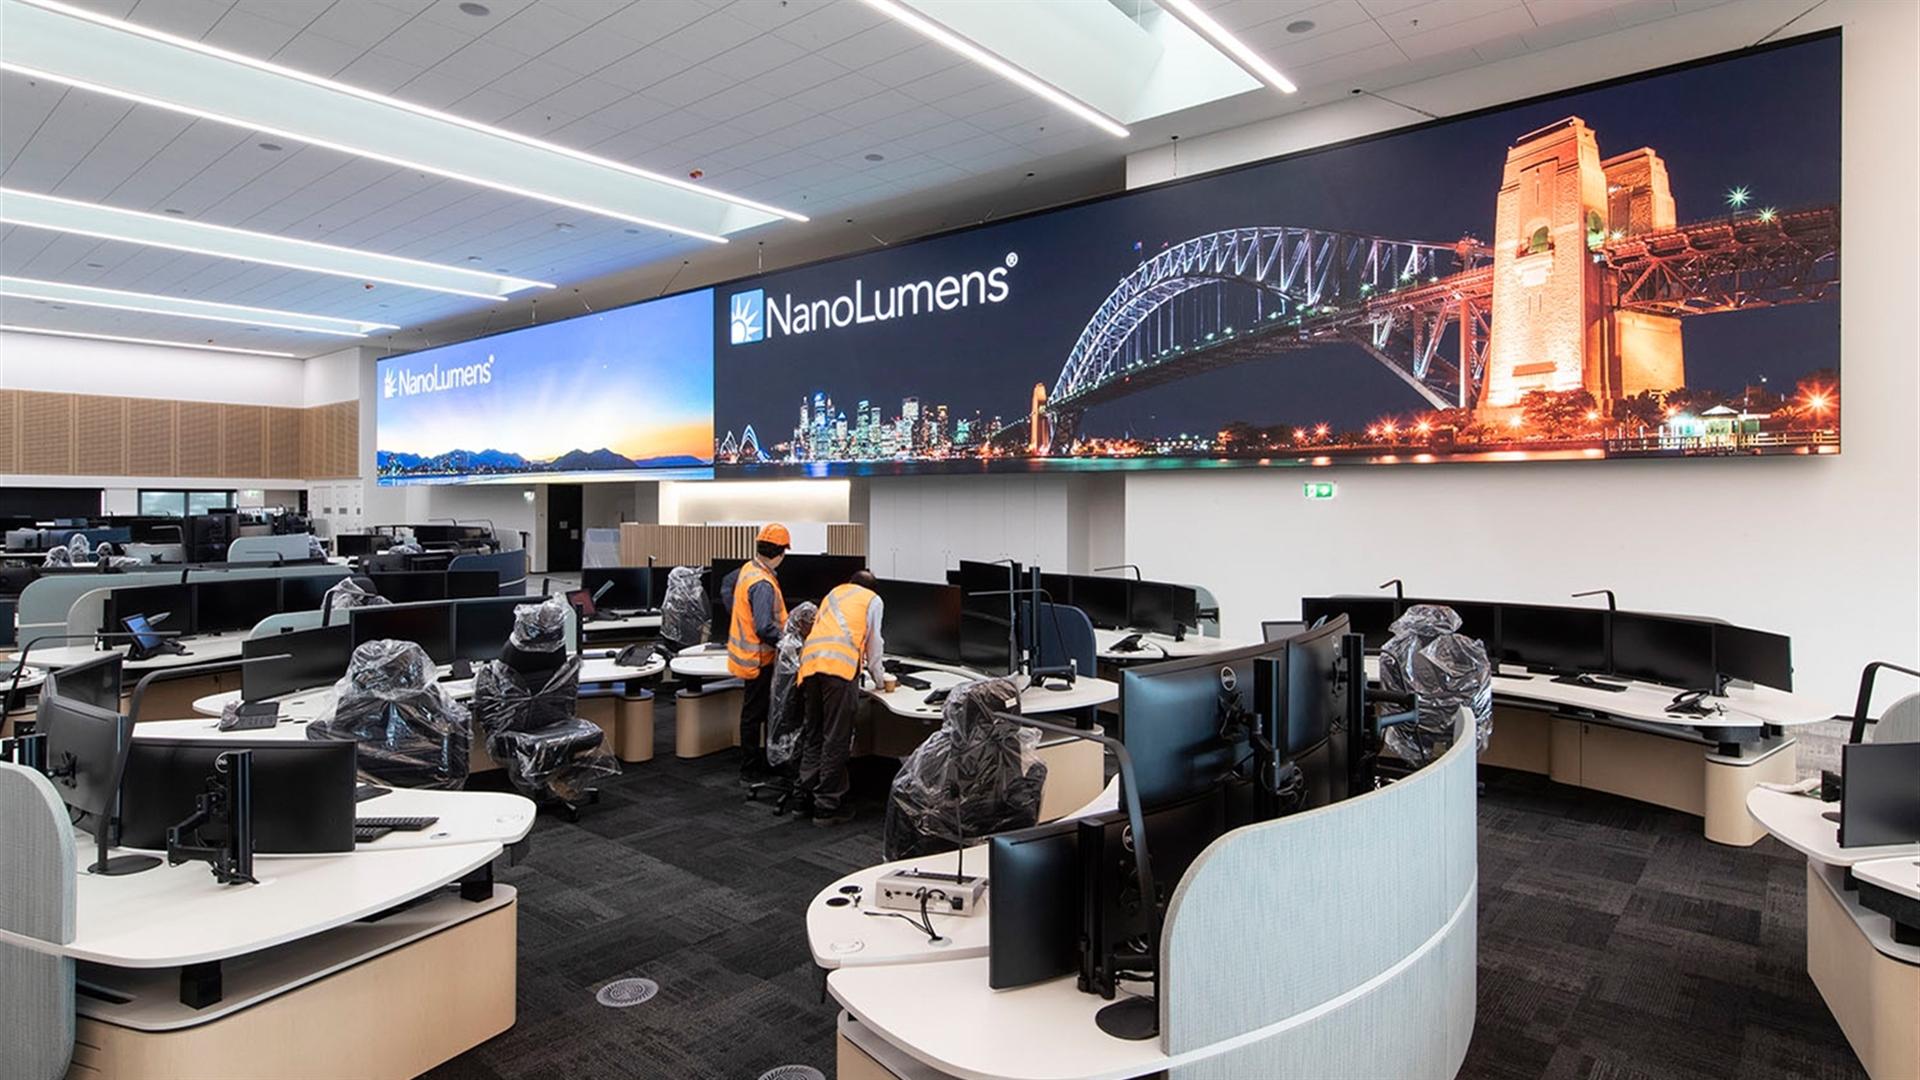 Sydney Trains ROC installed with largest NanoLumens display